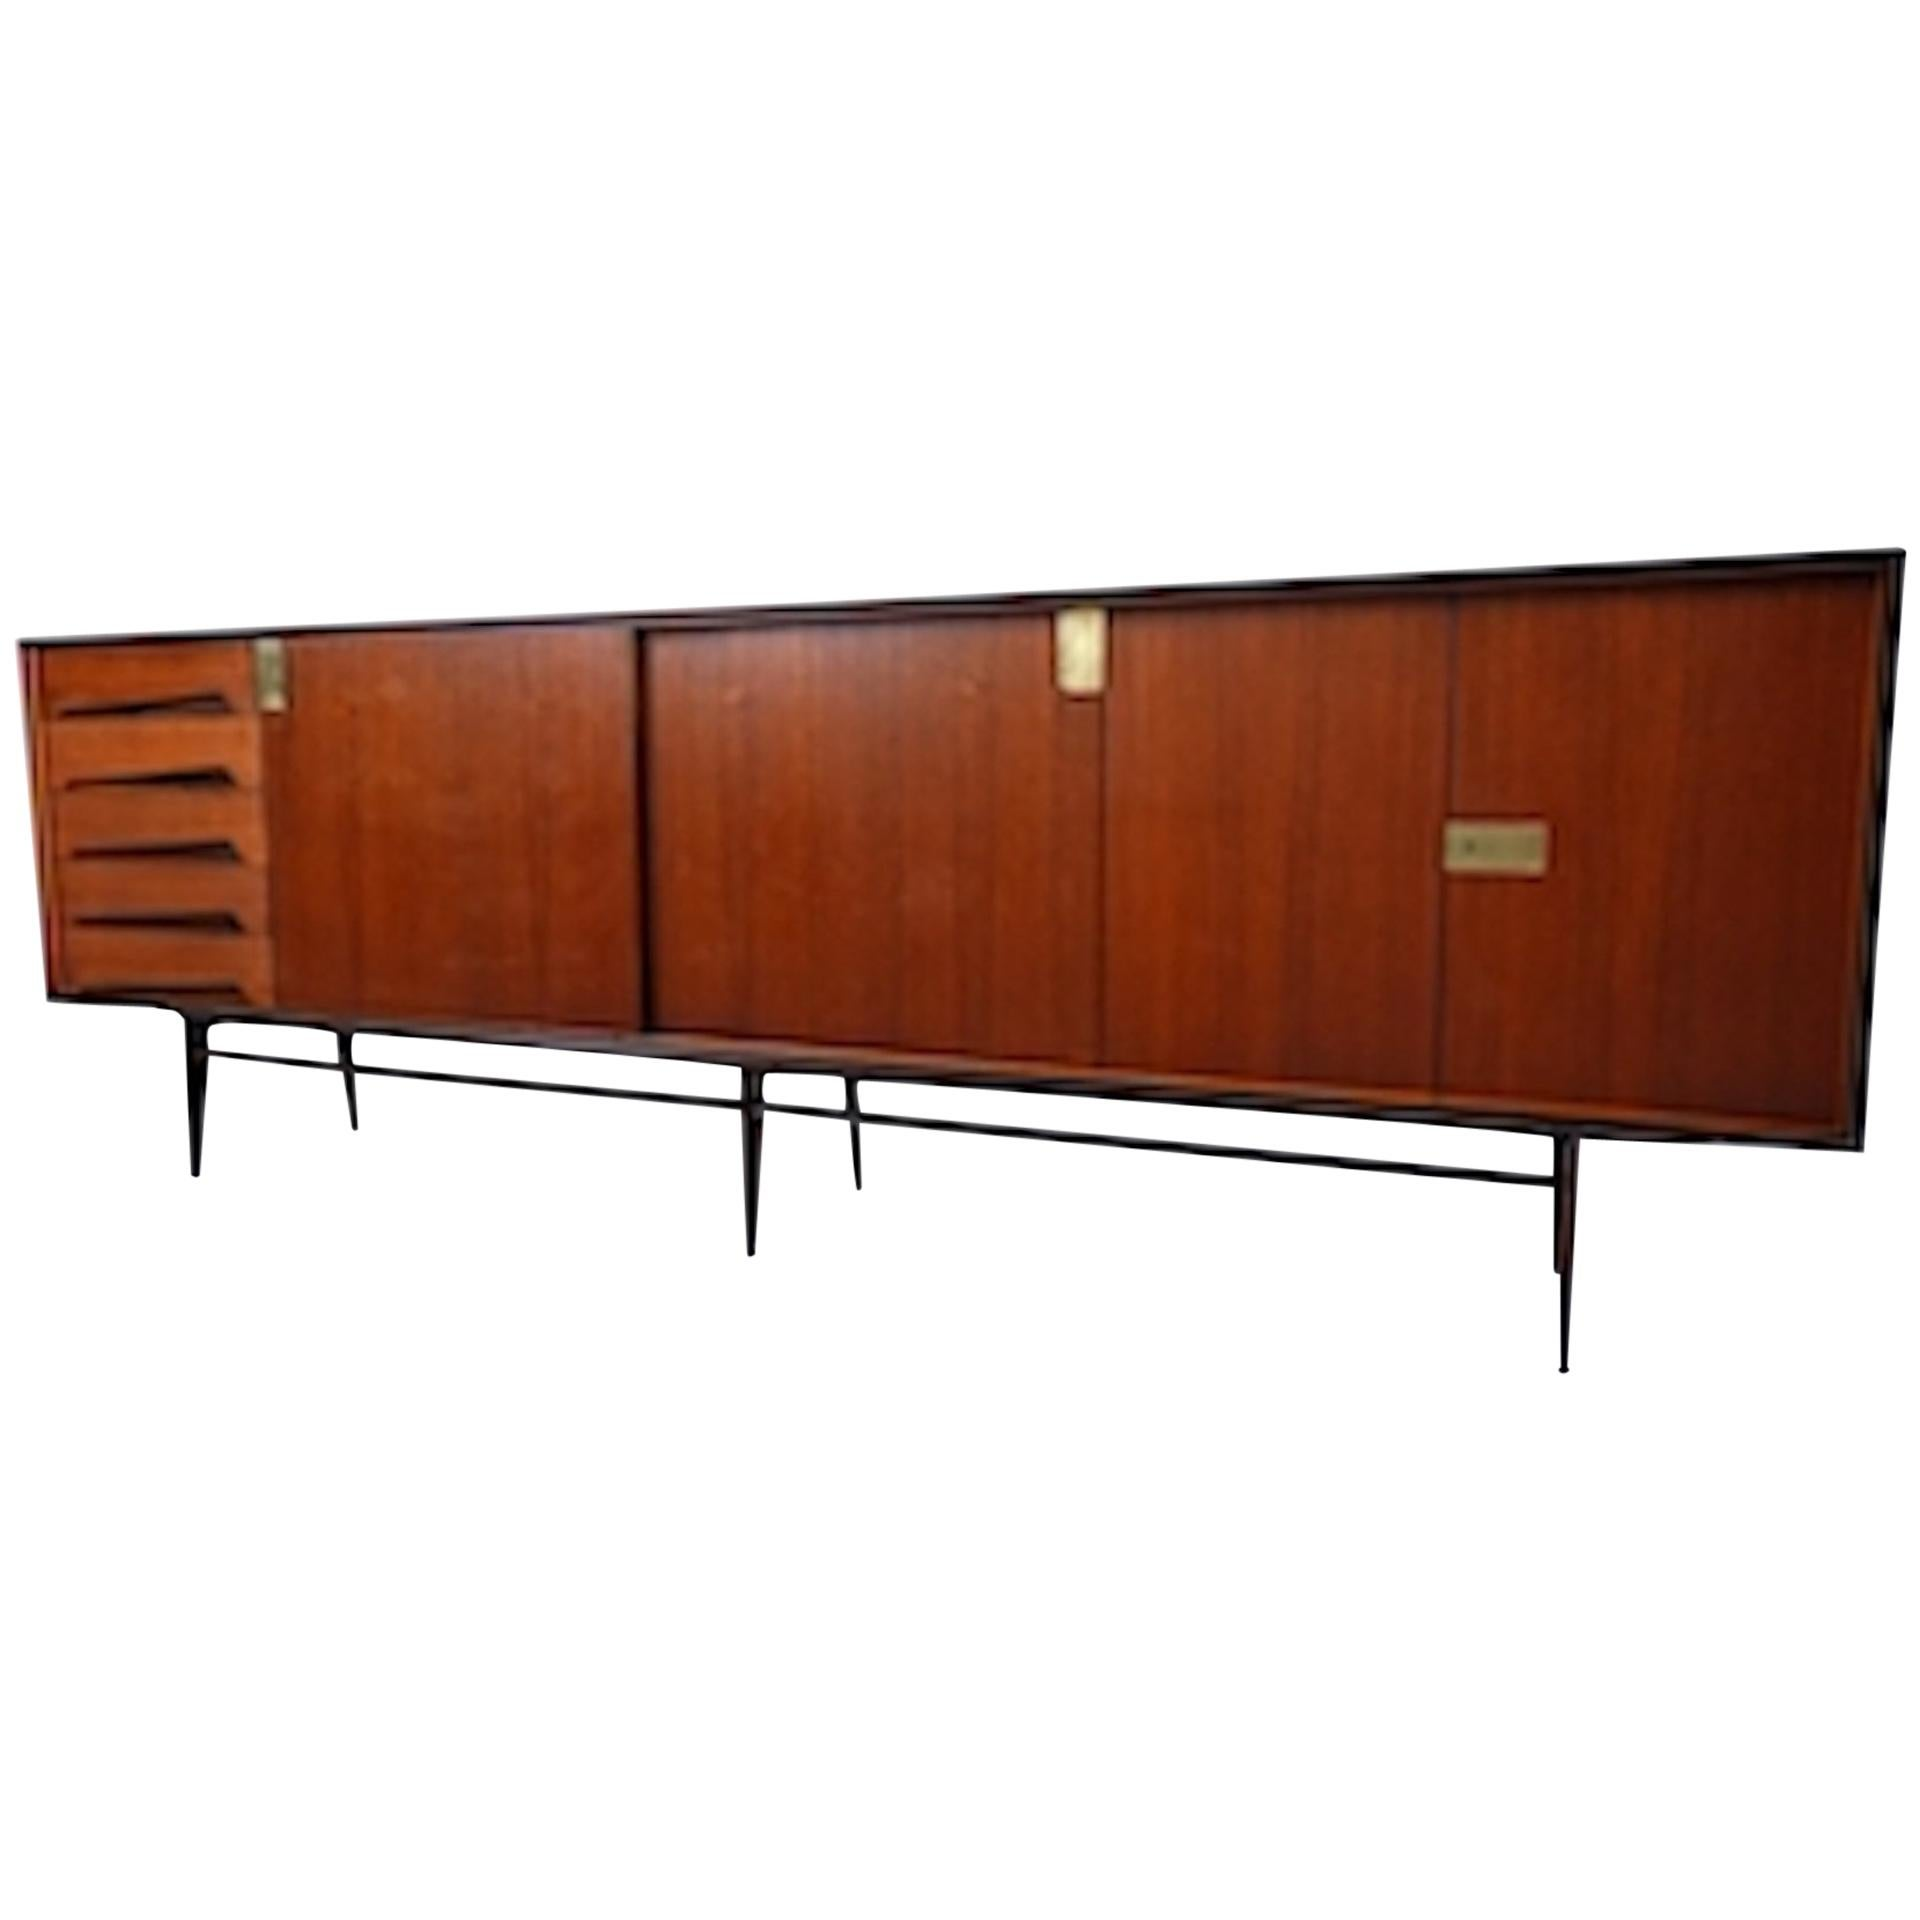 Italian Sideboard by Vittorio Dassi, 1950s